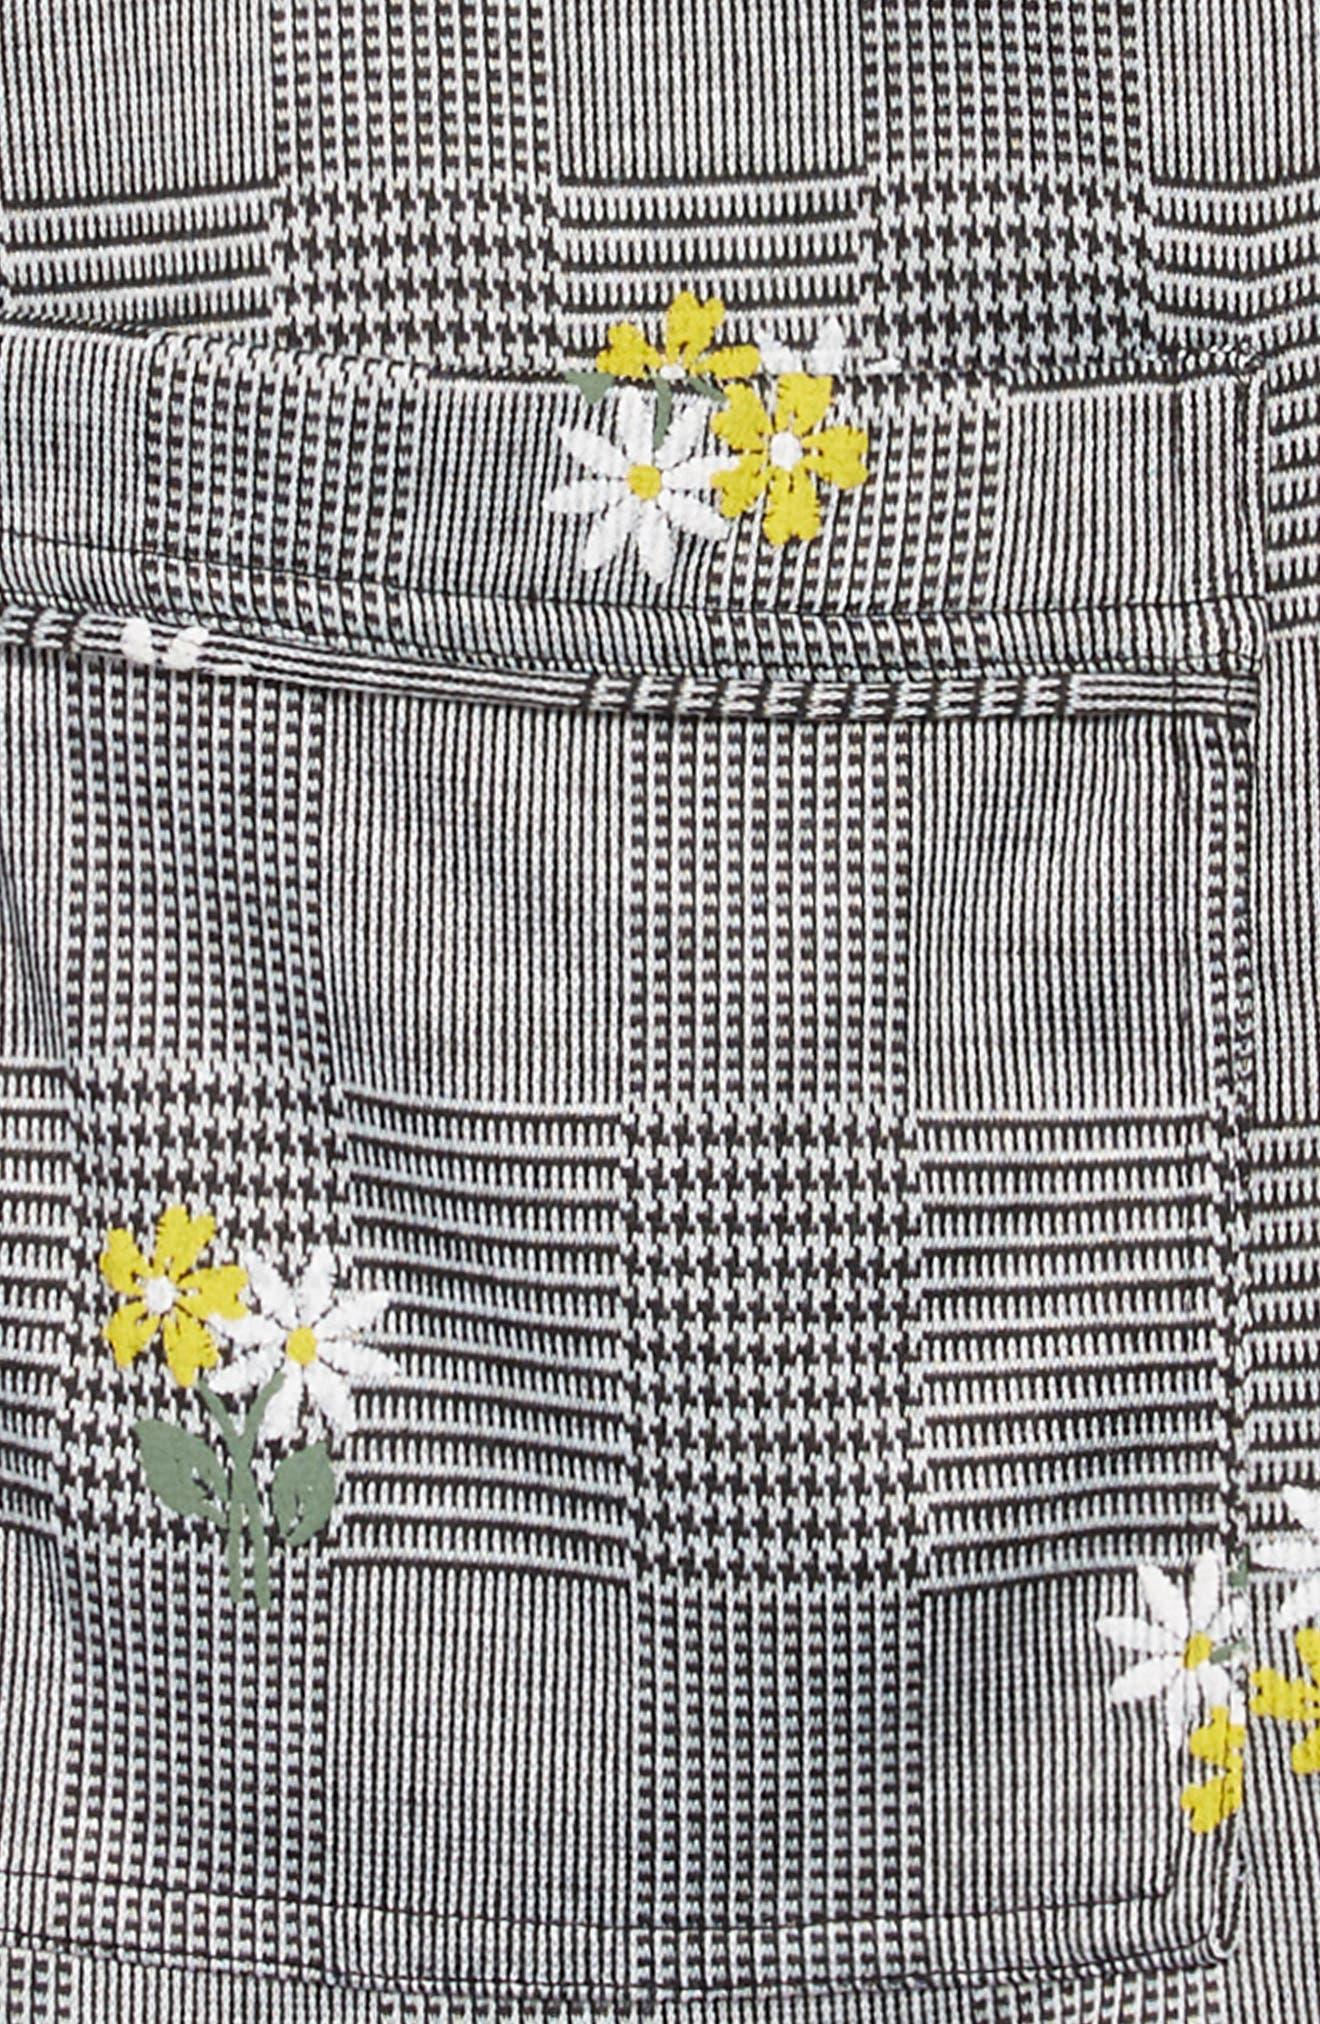 Embroidered Plaid Jumper,                             Alternate thumbnail 3, color,                             BLACK/ WHITE PLAID